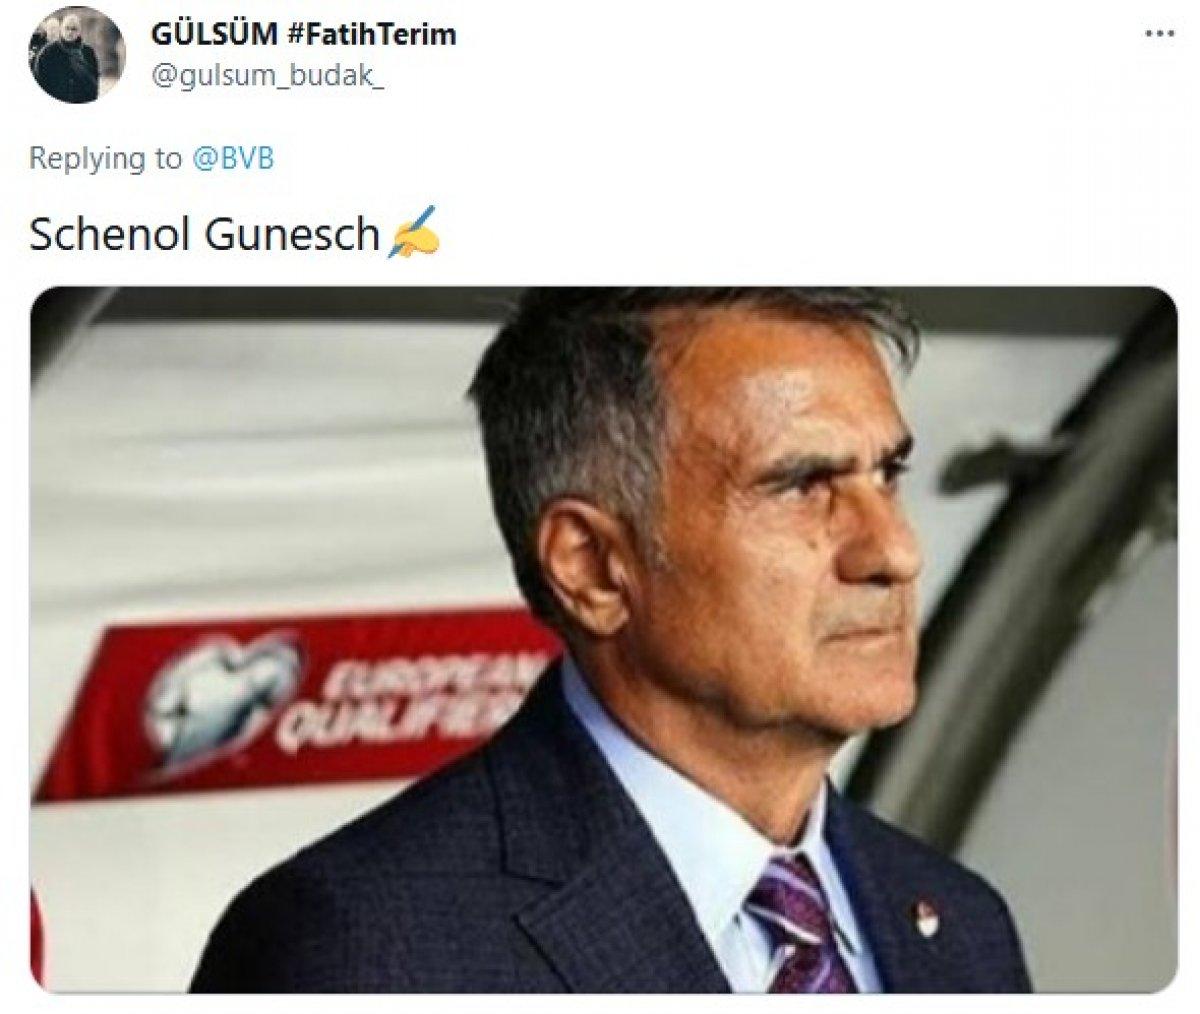 Dortmund un paylaşımı Şenol Güneş e benzetildi #3